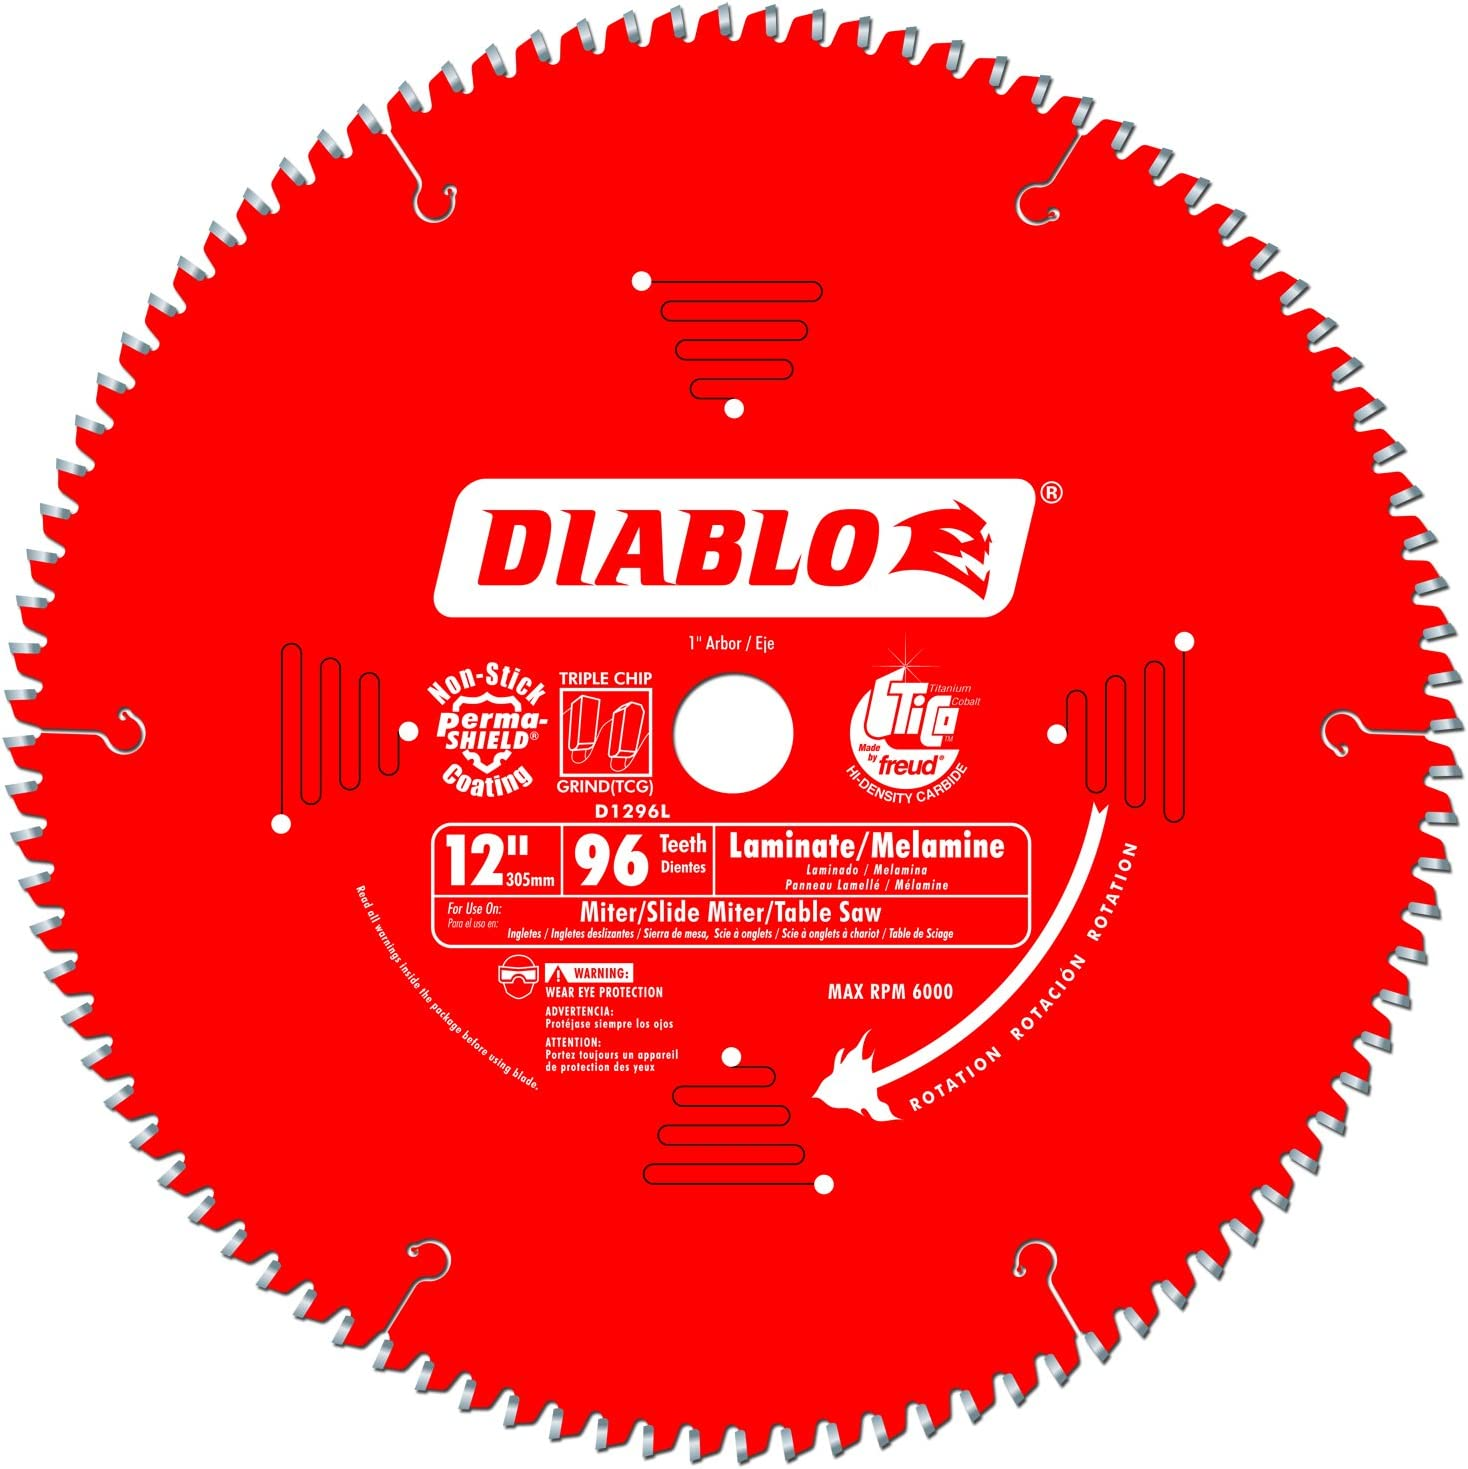 Diablo Melamine Laminate Flooring, What Saw Blade To Use For Cutting Laminate Flooring